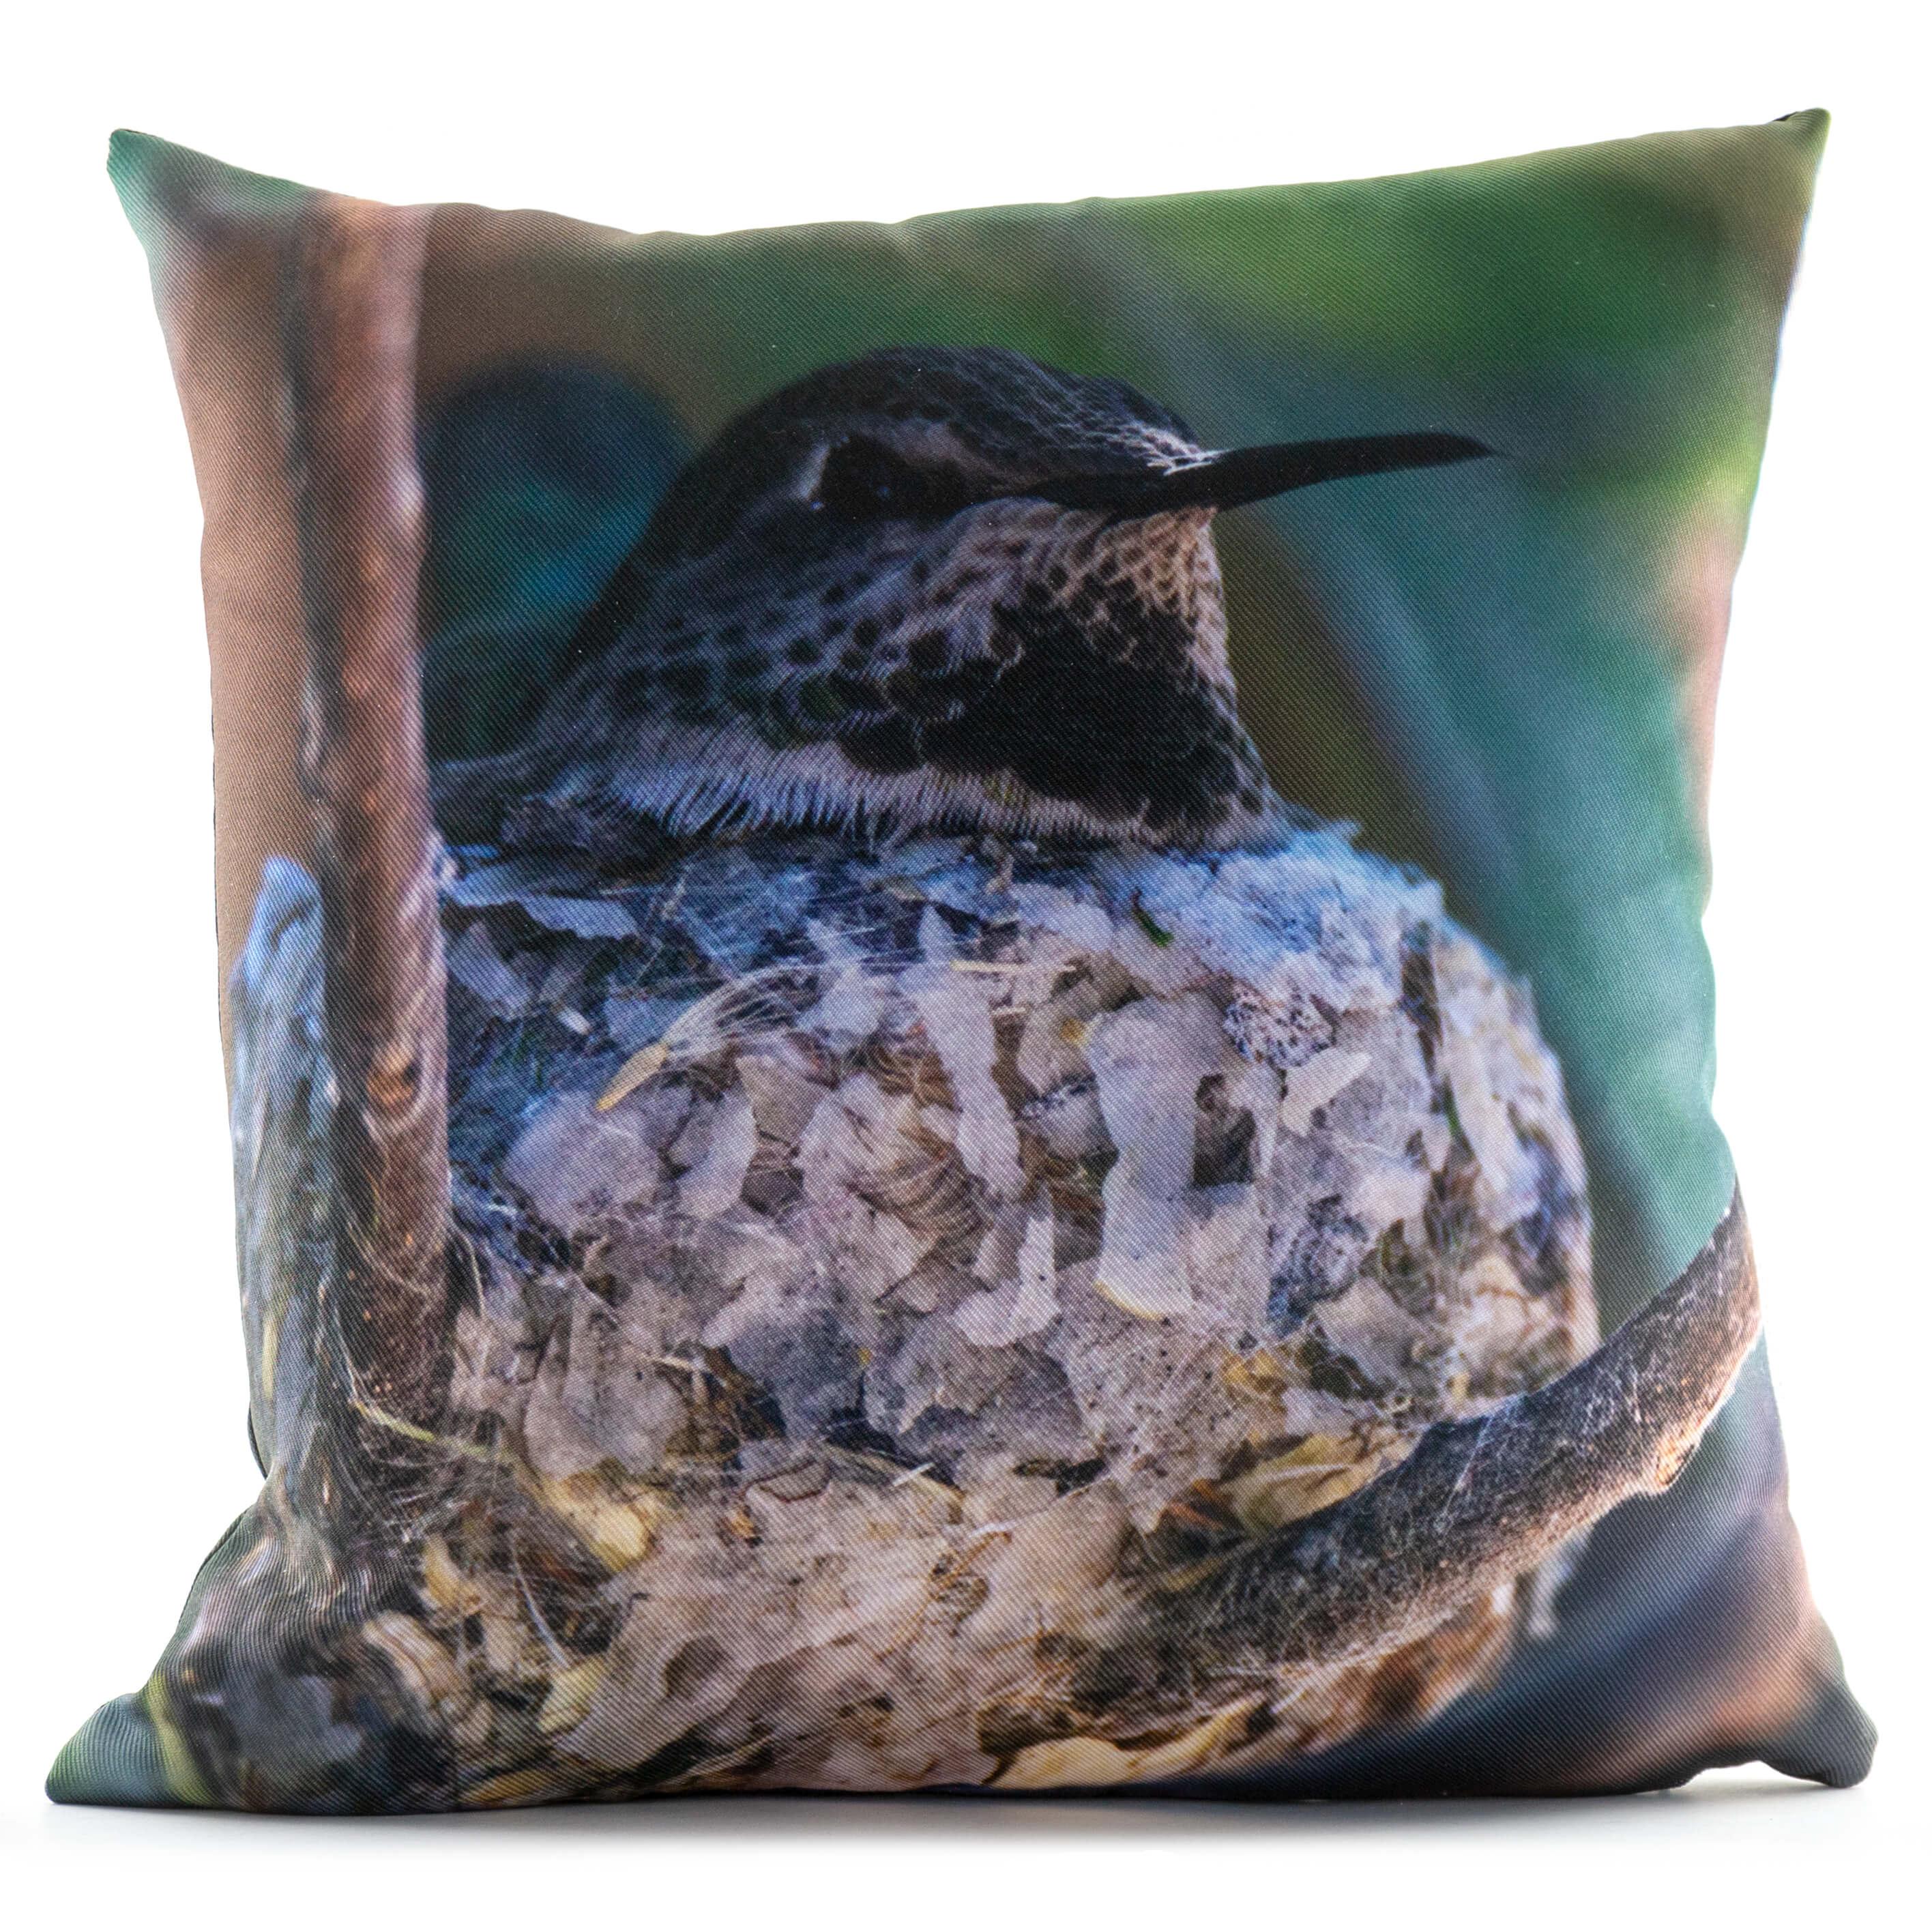 Hummingbird On A Nest 14in Throw Pillow